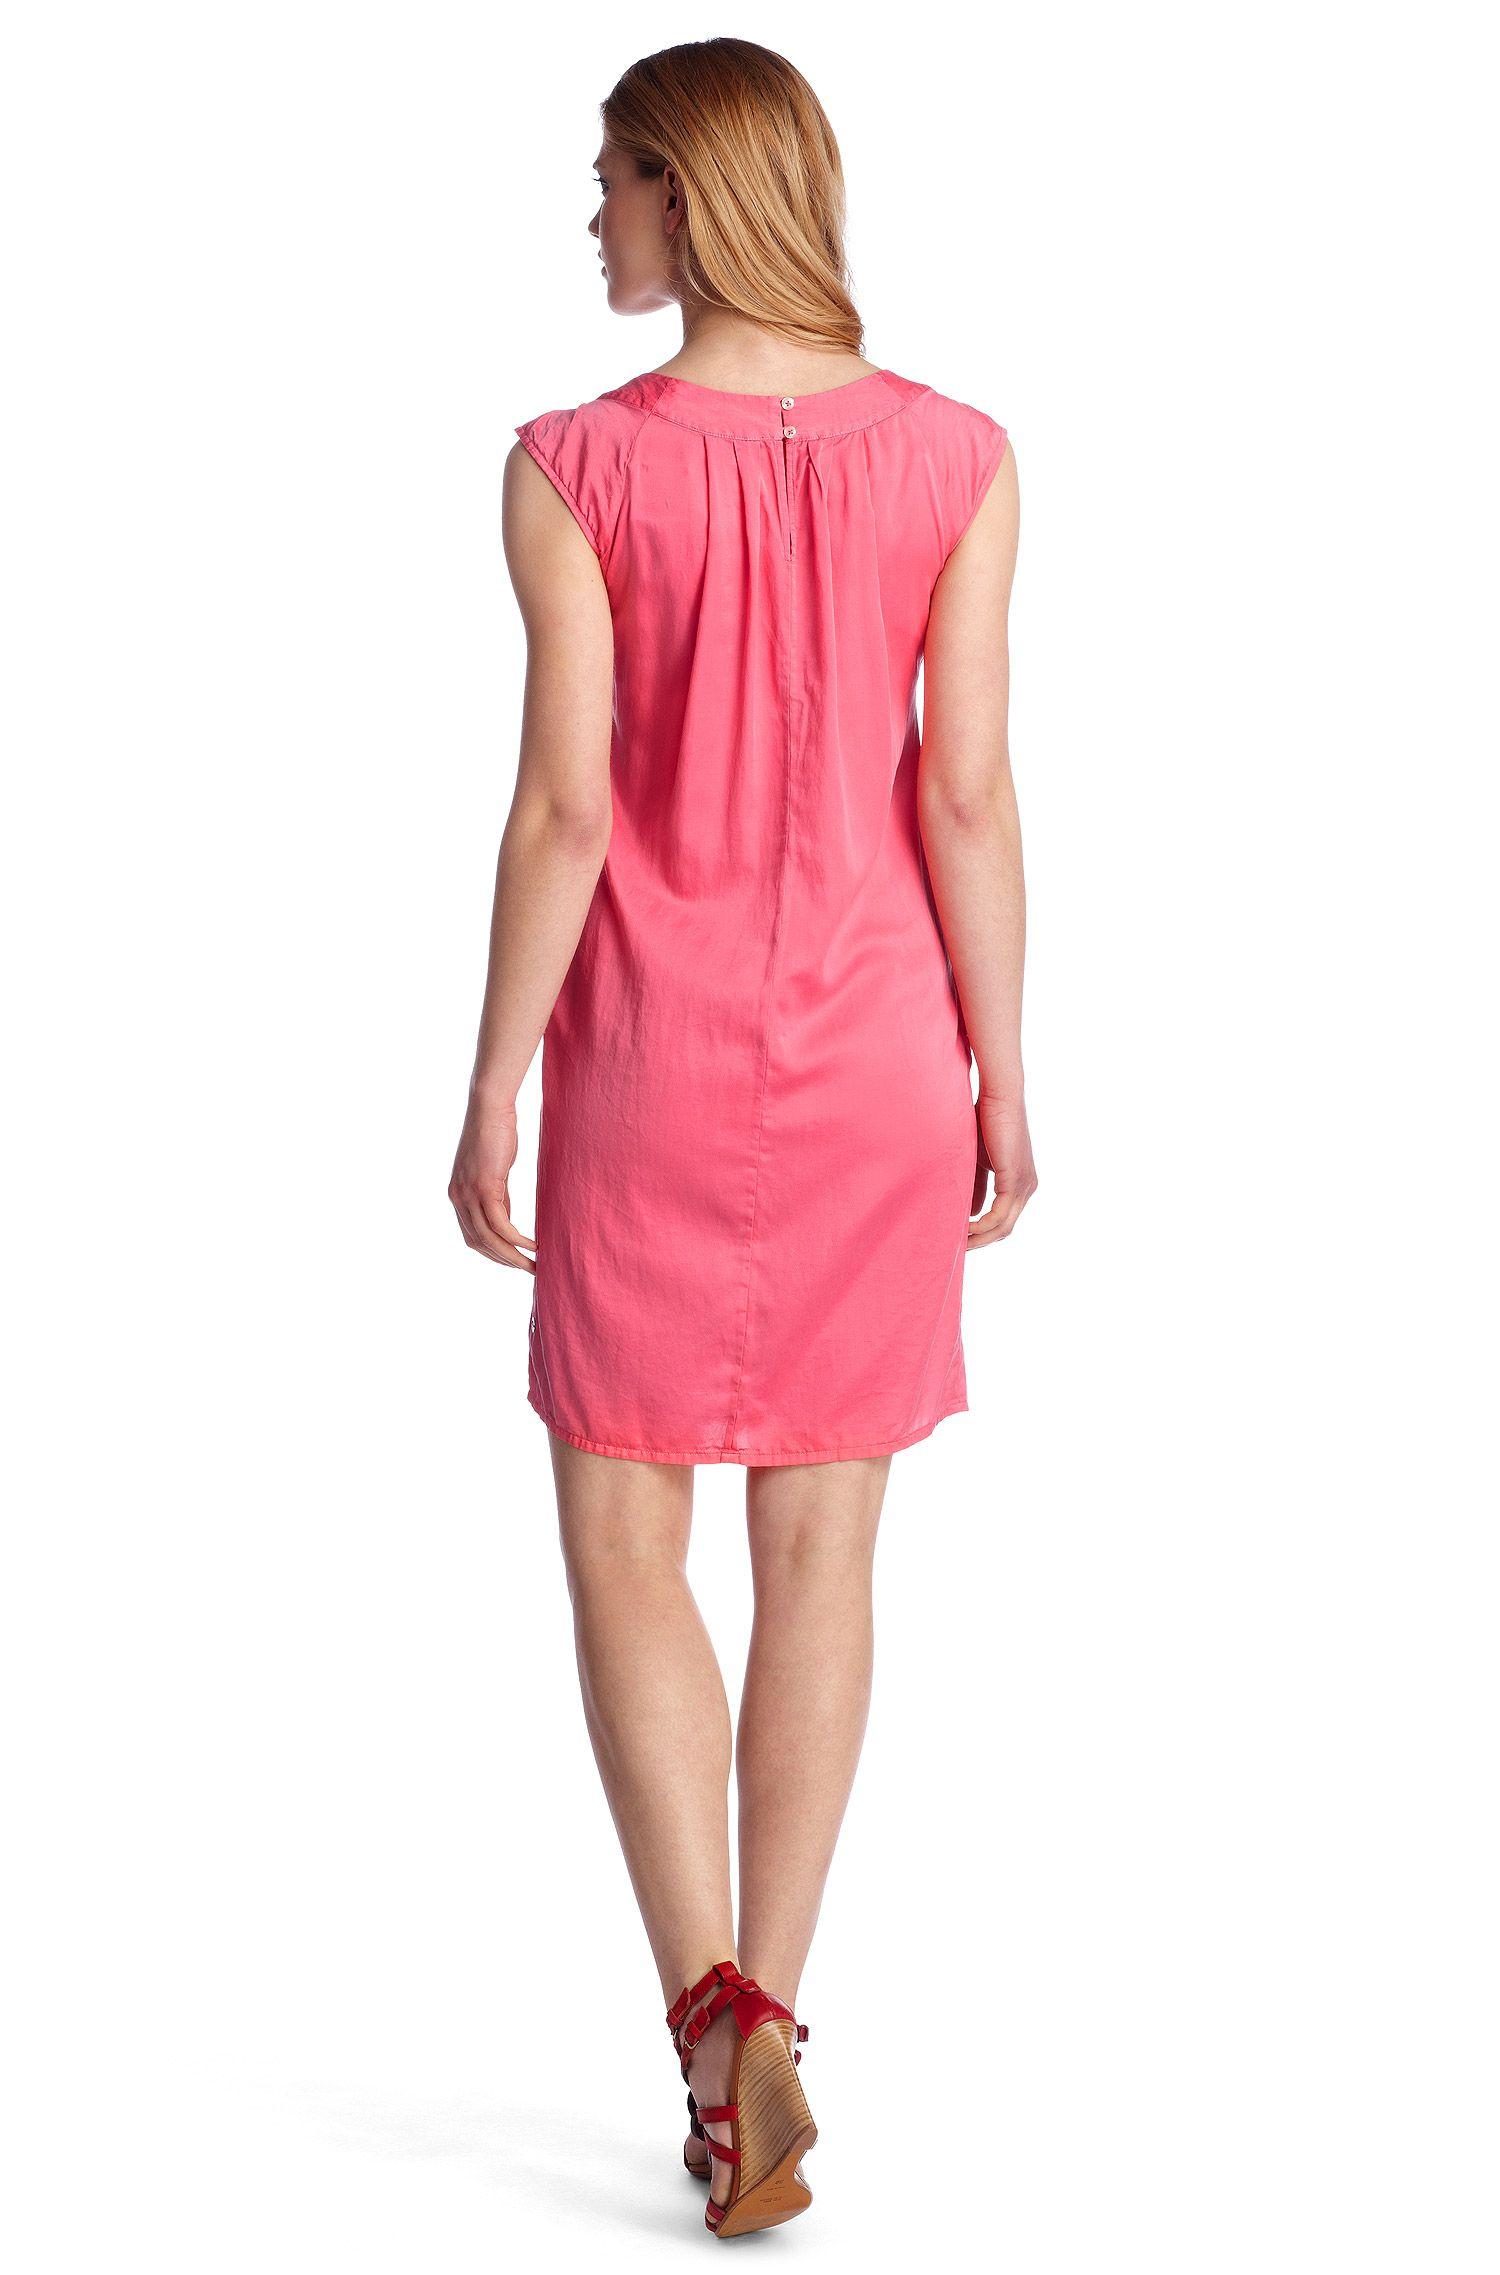 Long-Bluse/Kleid ´Corianae_1` aus Seiden-Mix